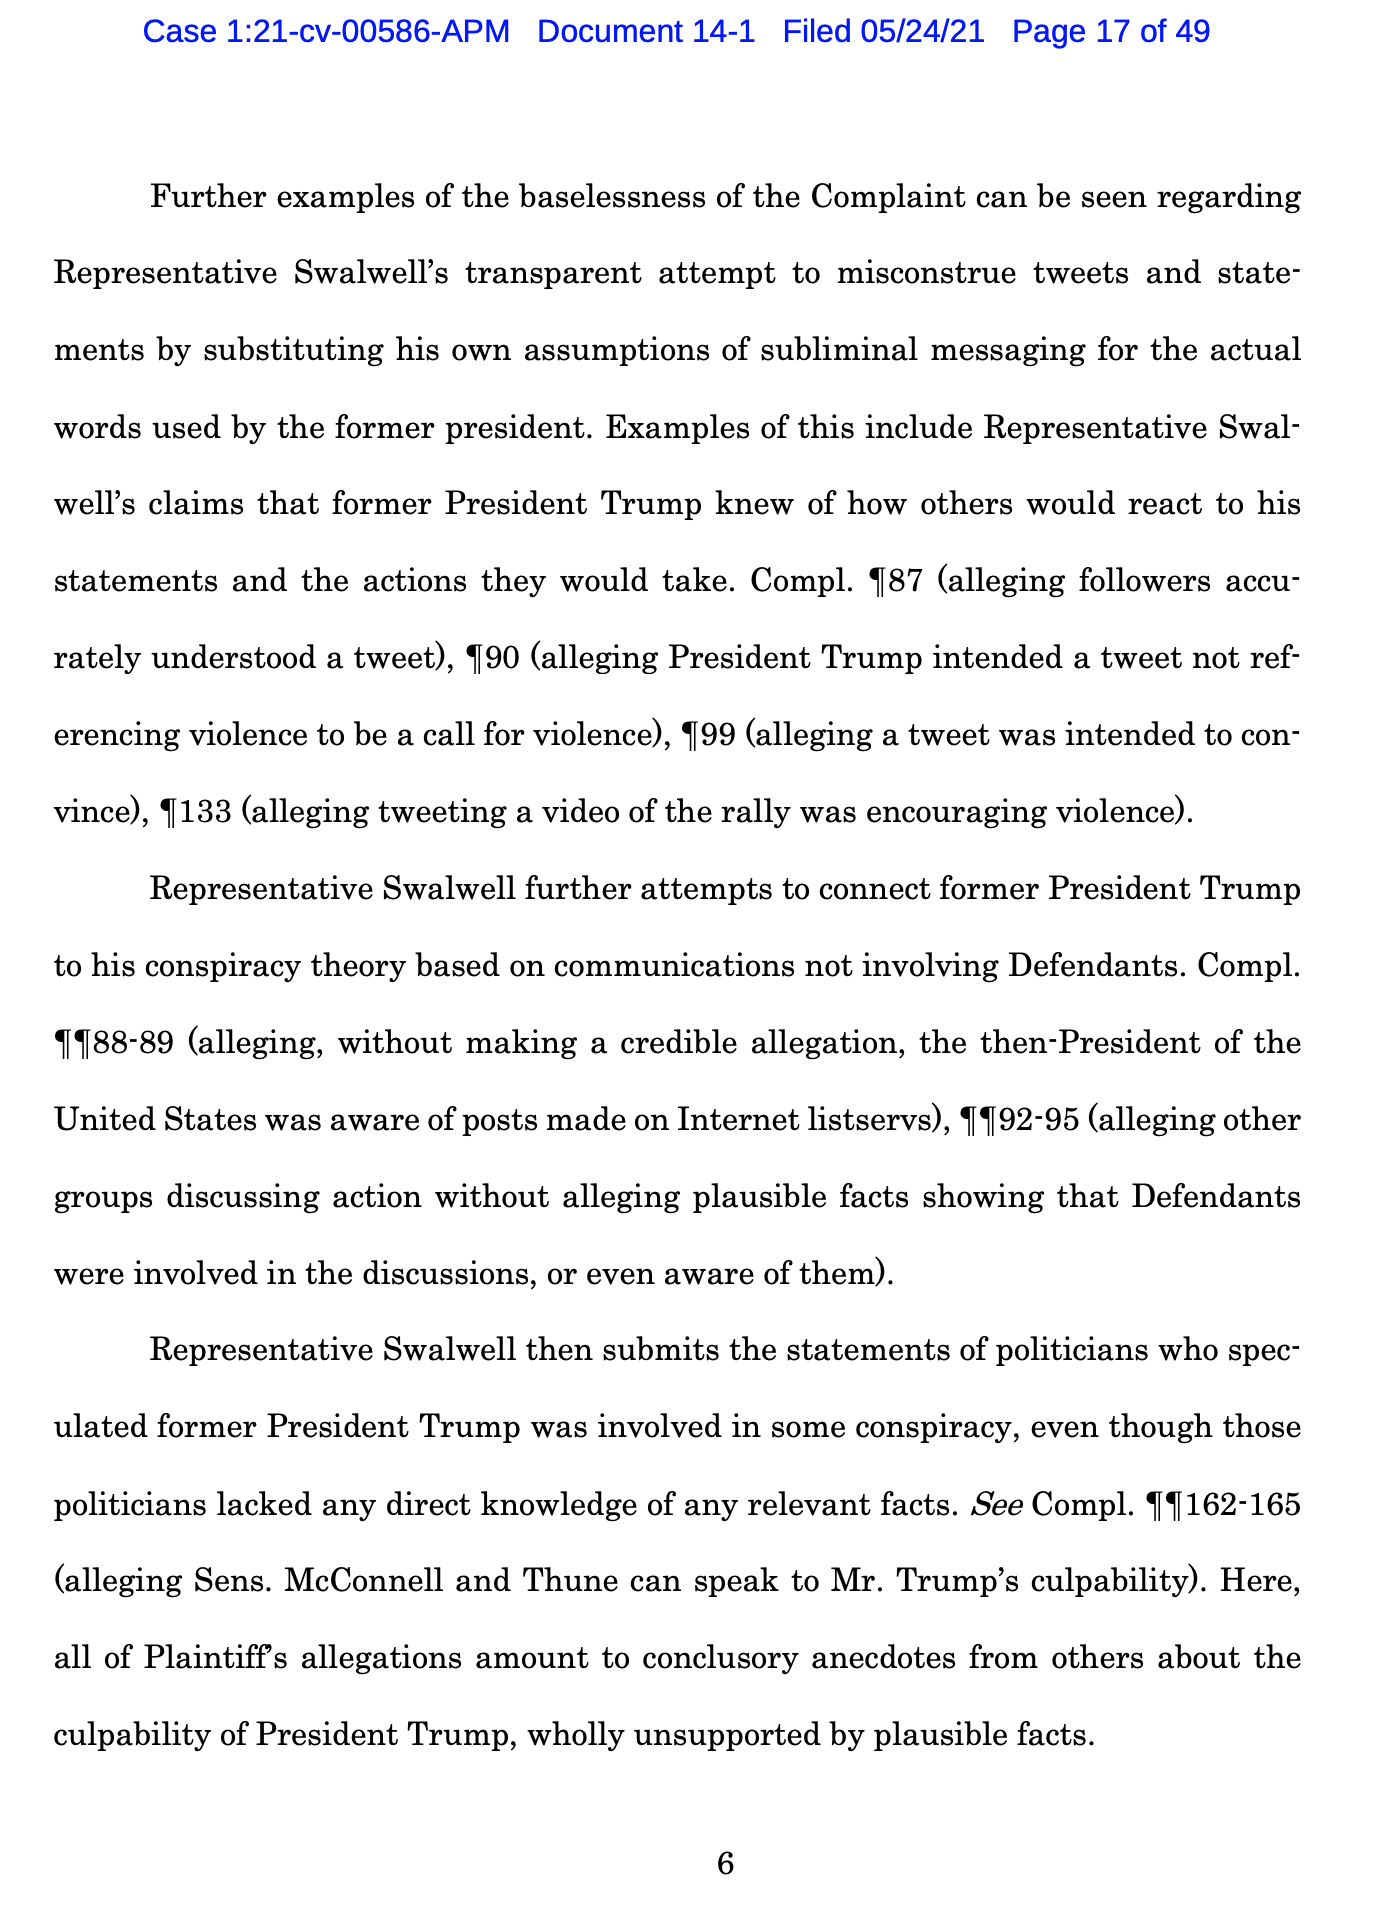 Screen-Shot-2021-05-25-at-9.49.53-AM Trump Declares Full Immunity From Jan. 6 Insurrection Lawsuit Crime Donald Trump Featured Politics Top Stories